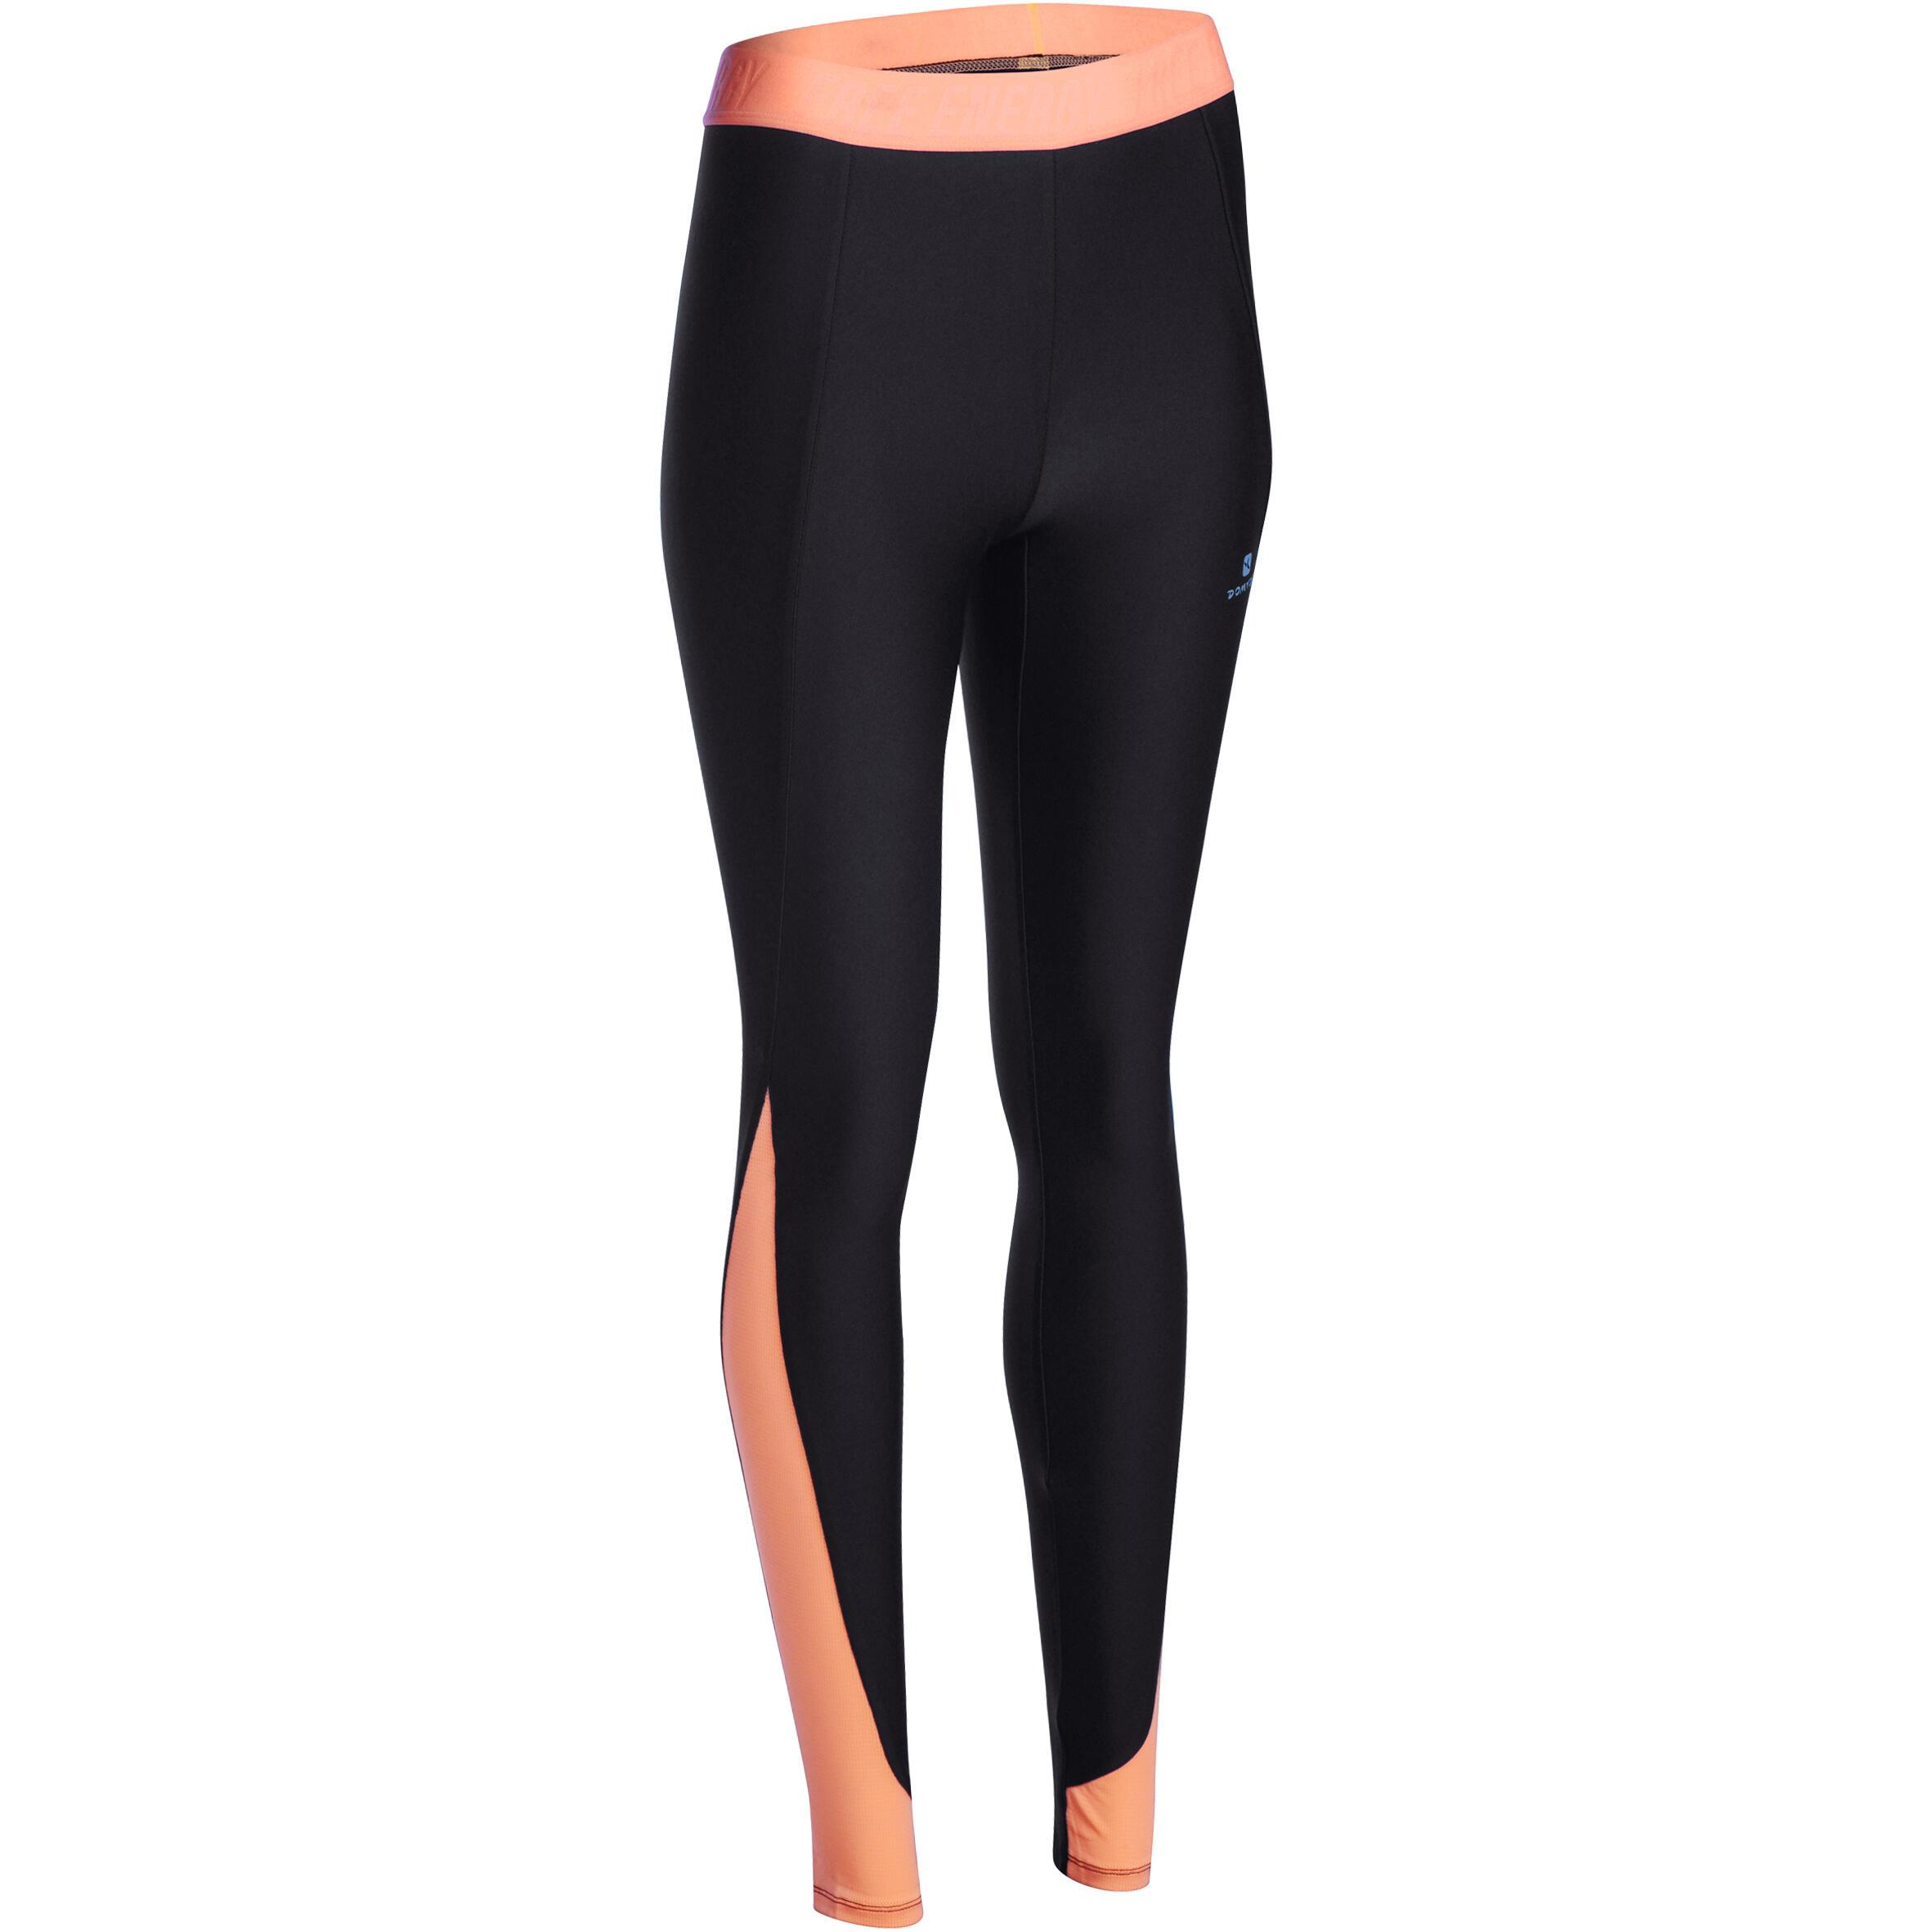 Energy+ Women's Breathable Cardio Fitness Leggings - Hitam/Jingga